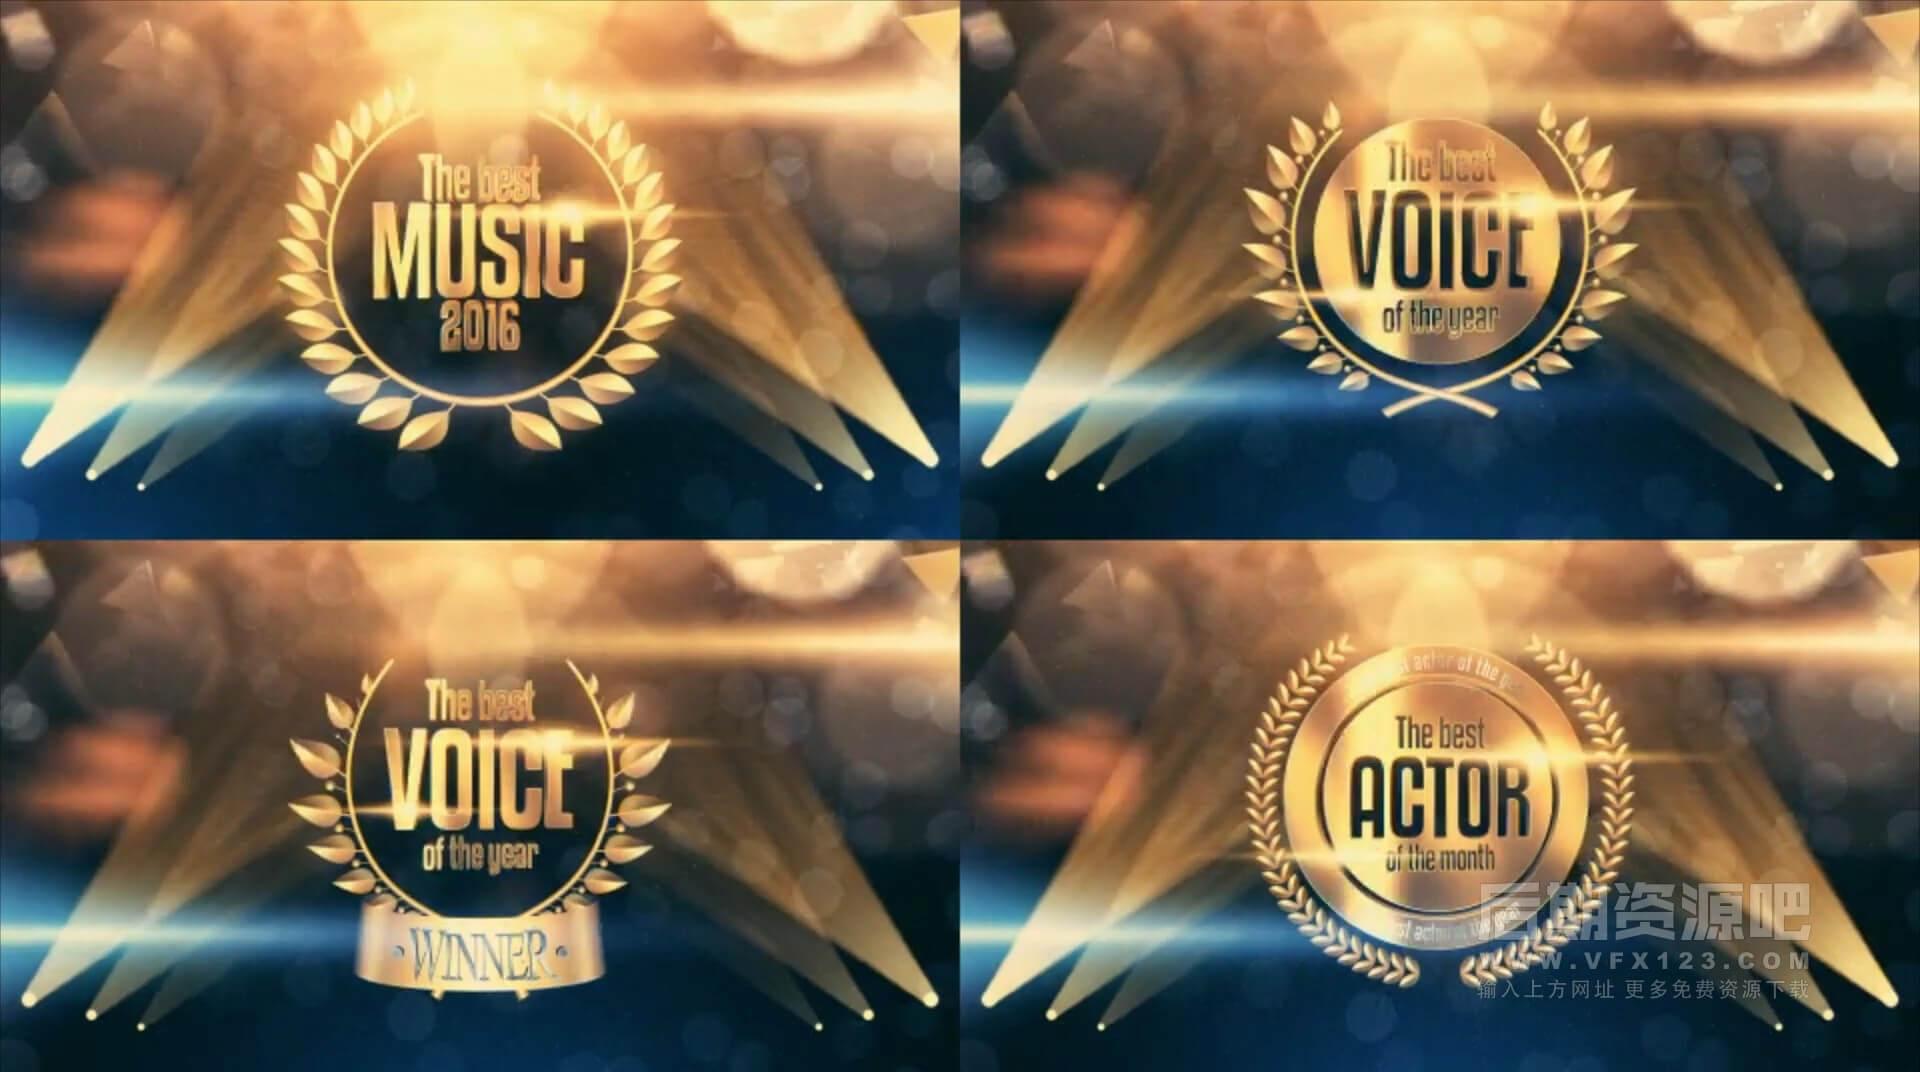 Ae模板 震撼大气黄金粒子颁奖典礼开幕式包装素材 Golden Award